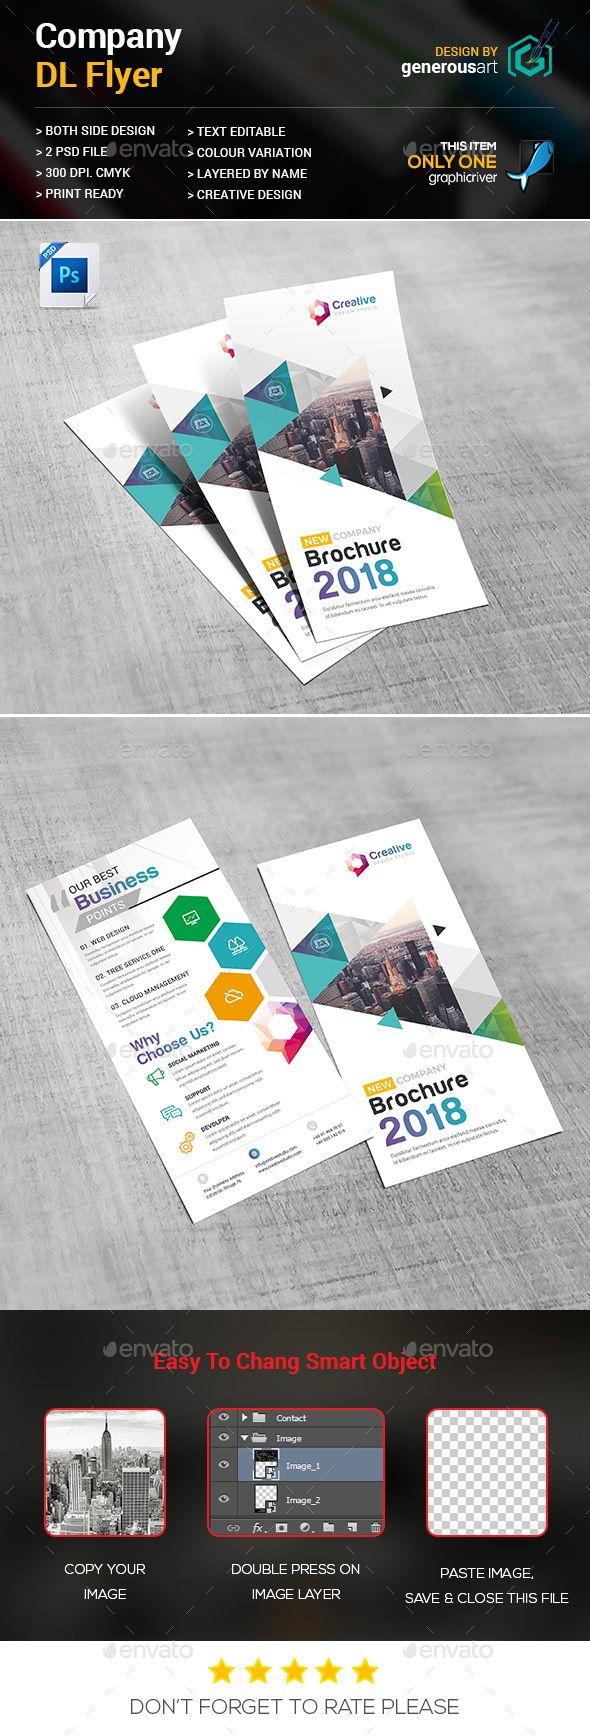 Company DLFlyer #modern dl flyer #designer  • Download here → https://graphicriver.net/item/company-dlflyer/20695313?ref=pxcr